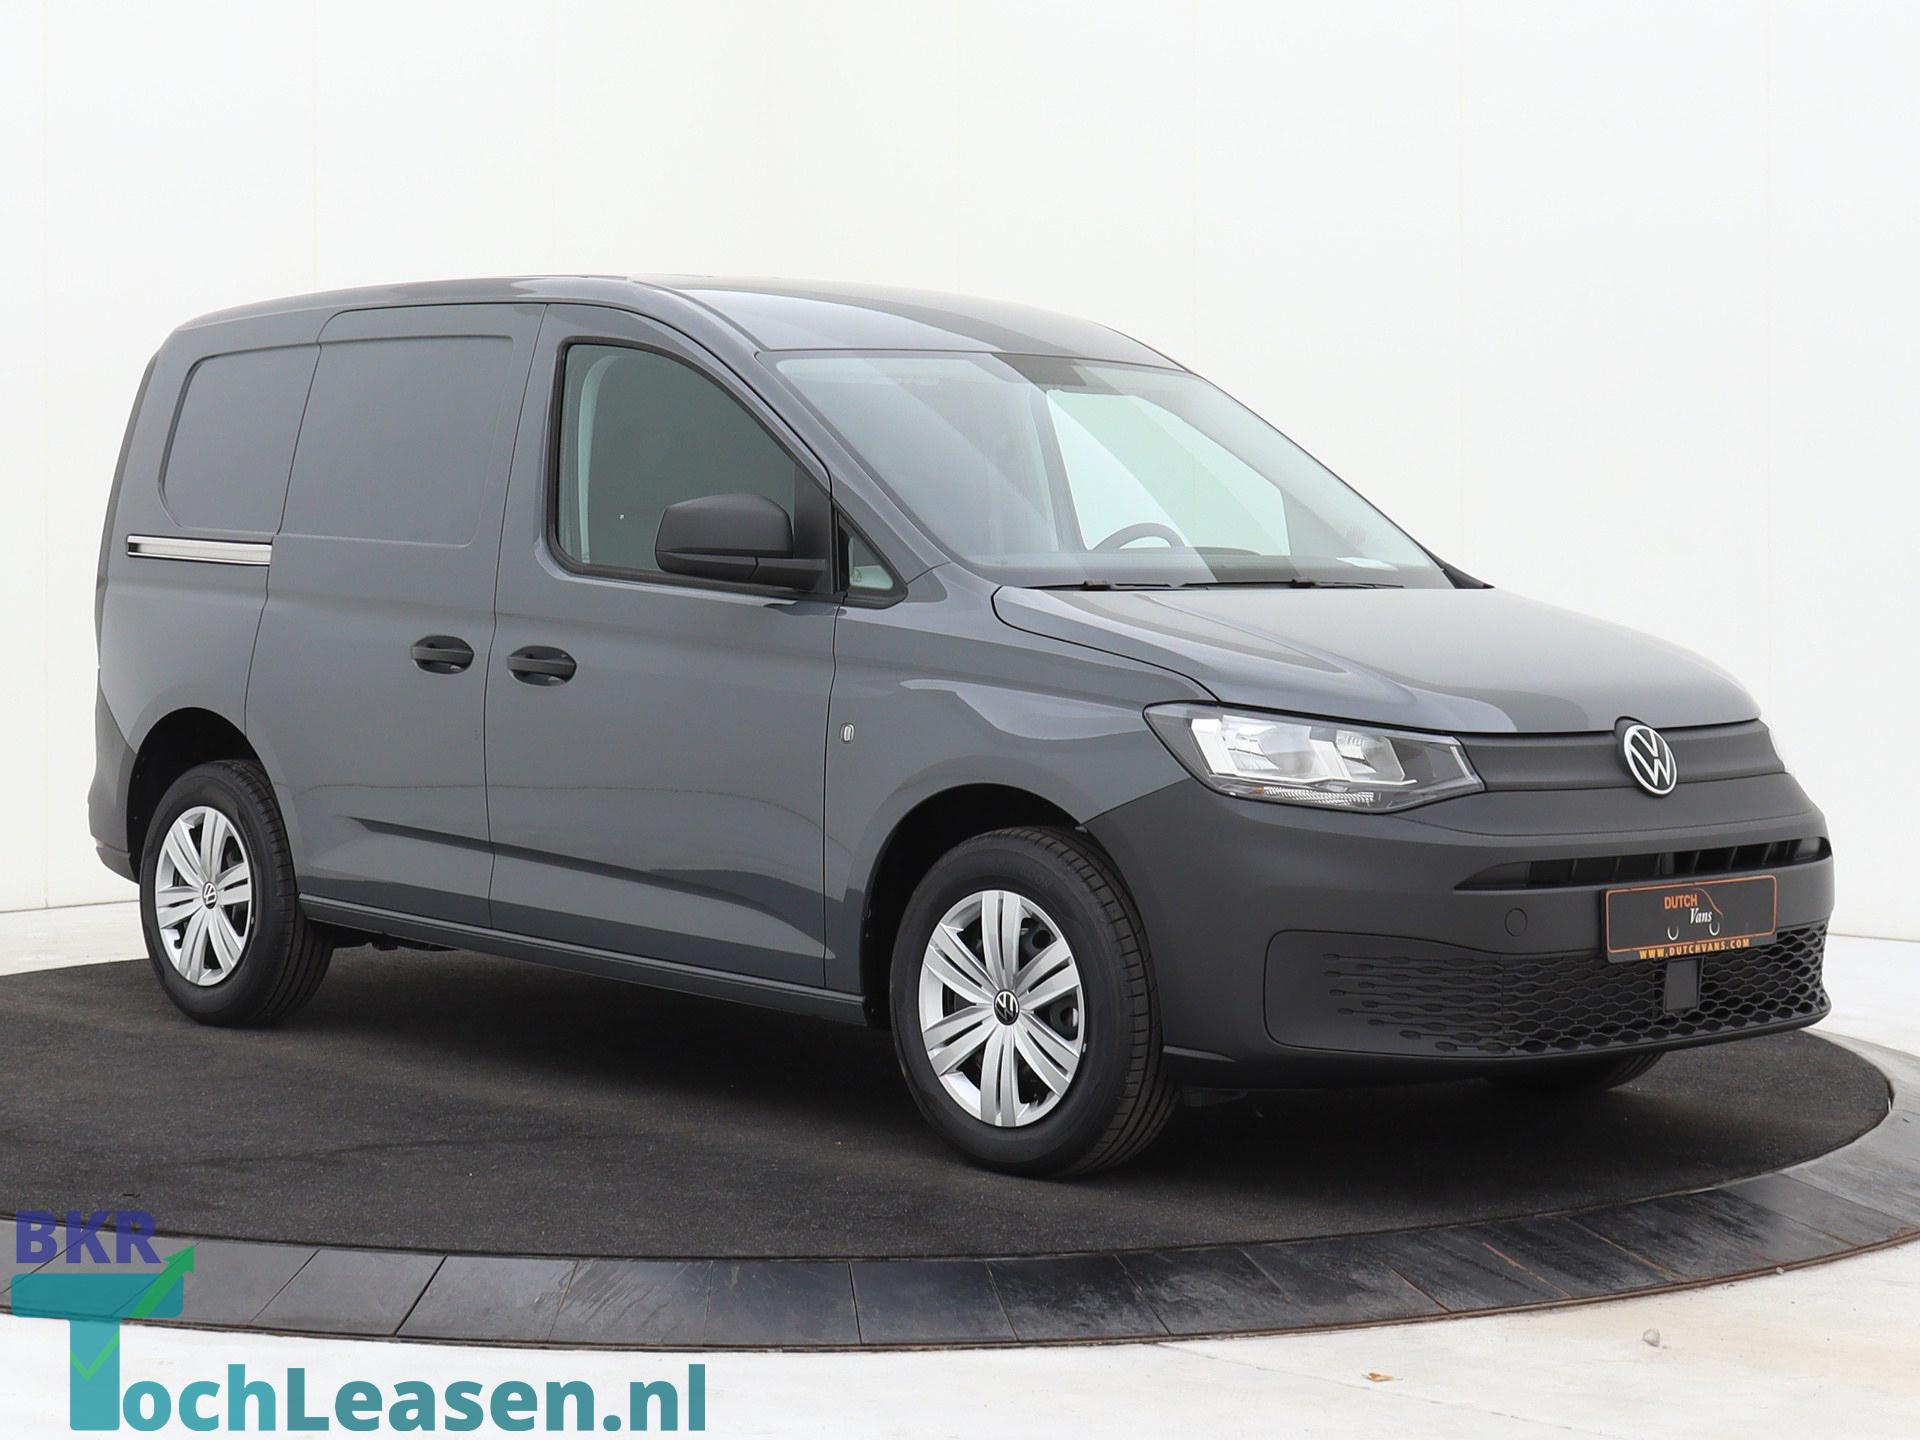 BKR toch leasen - Volkswagen Caddy - Grijs 19